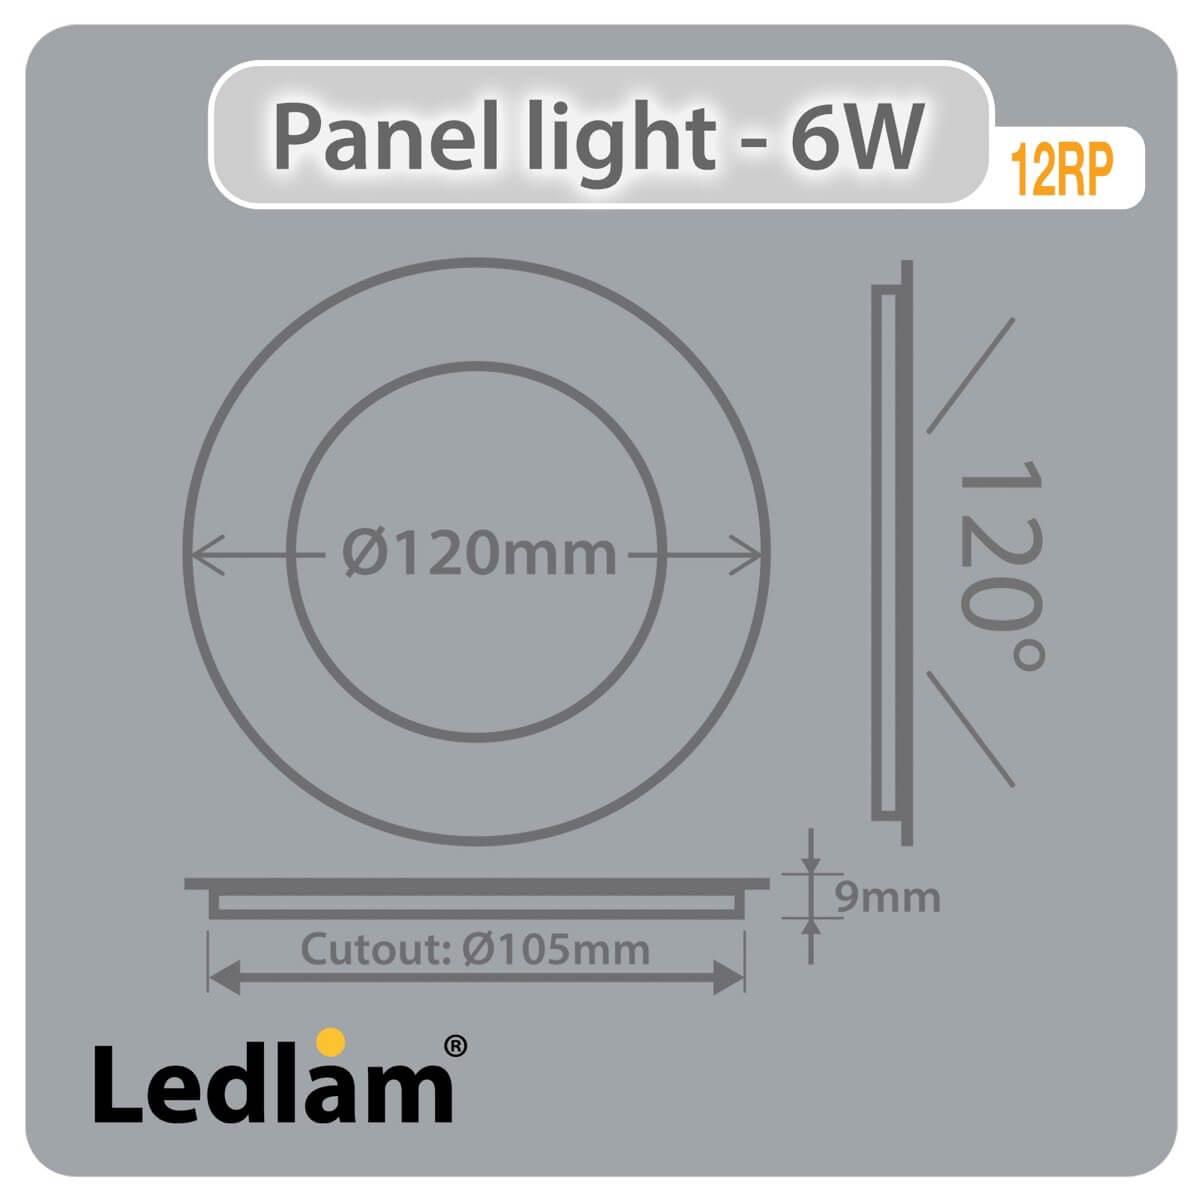 LED Panel Light 6W Round 12RPD - dimmable - Ledlam Lighting